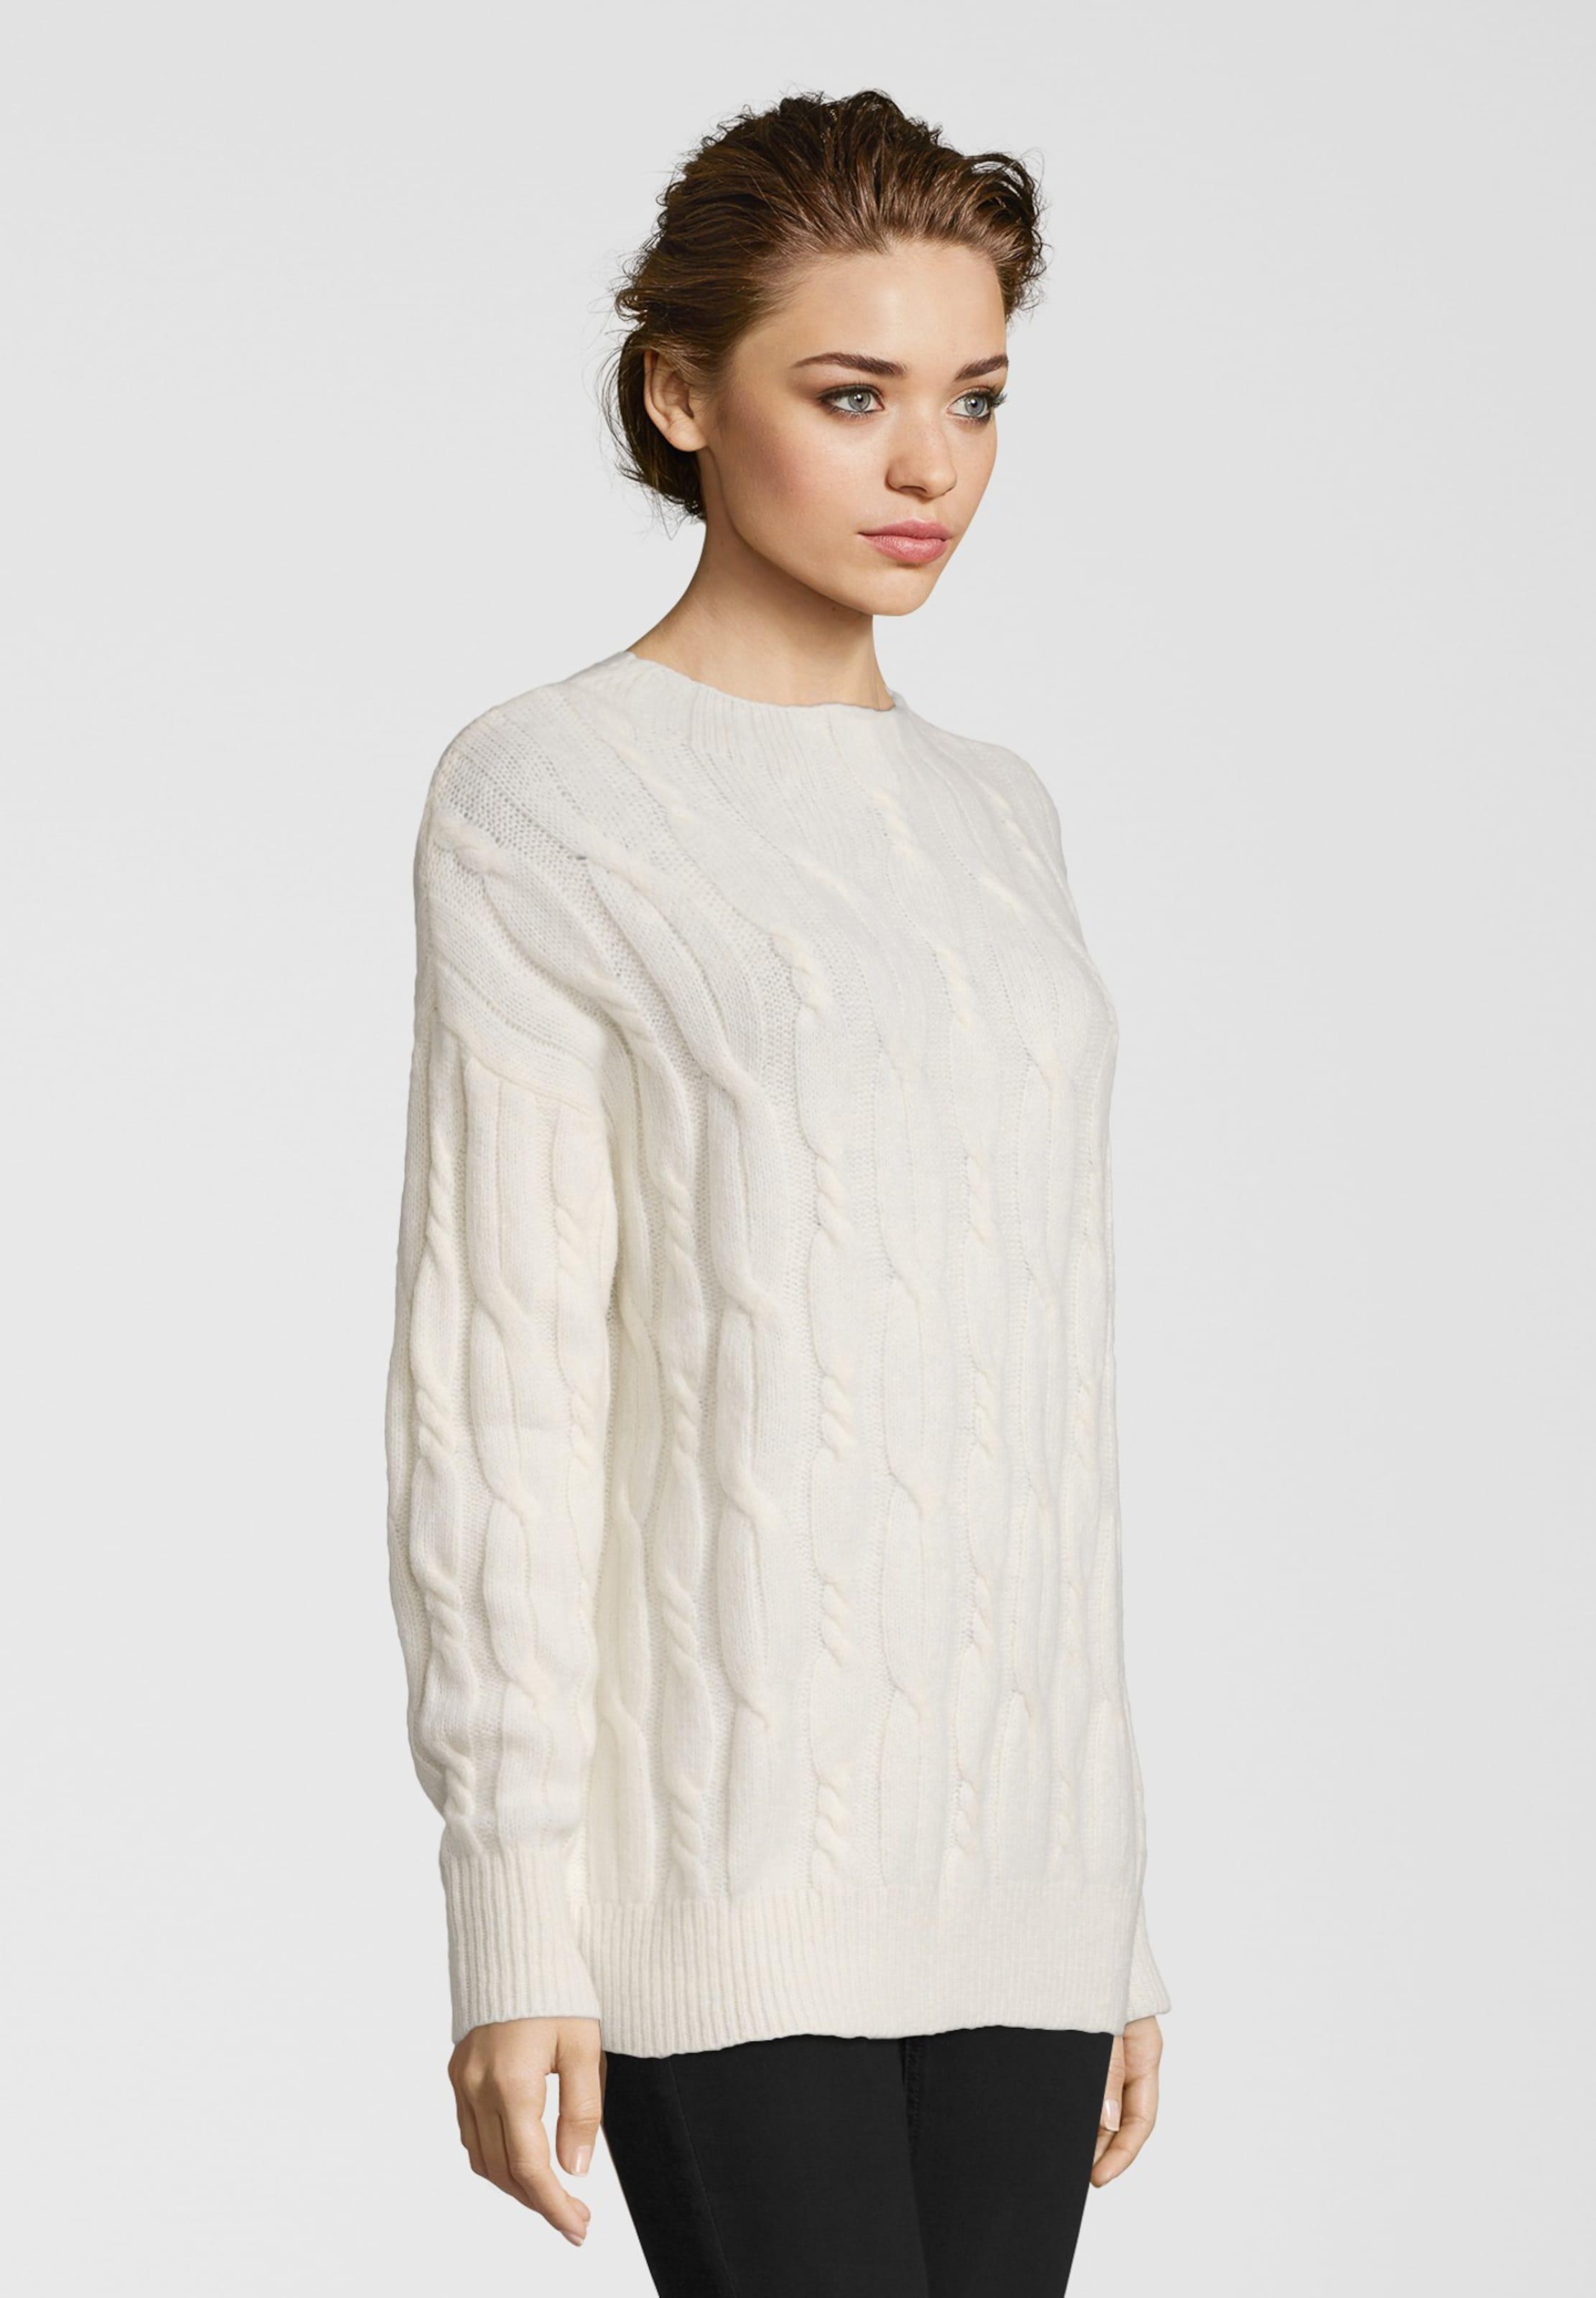 Frogbox Pullover Weiß In Muster Mit Zopfstrick xoQeWrdCEB